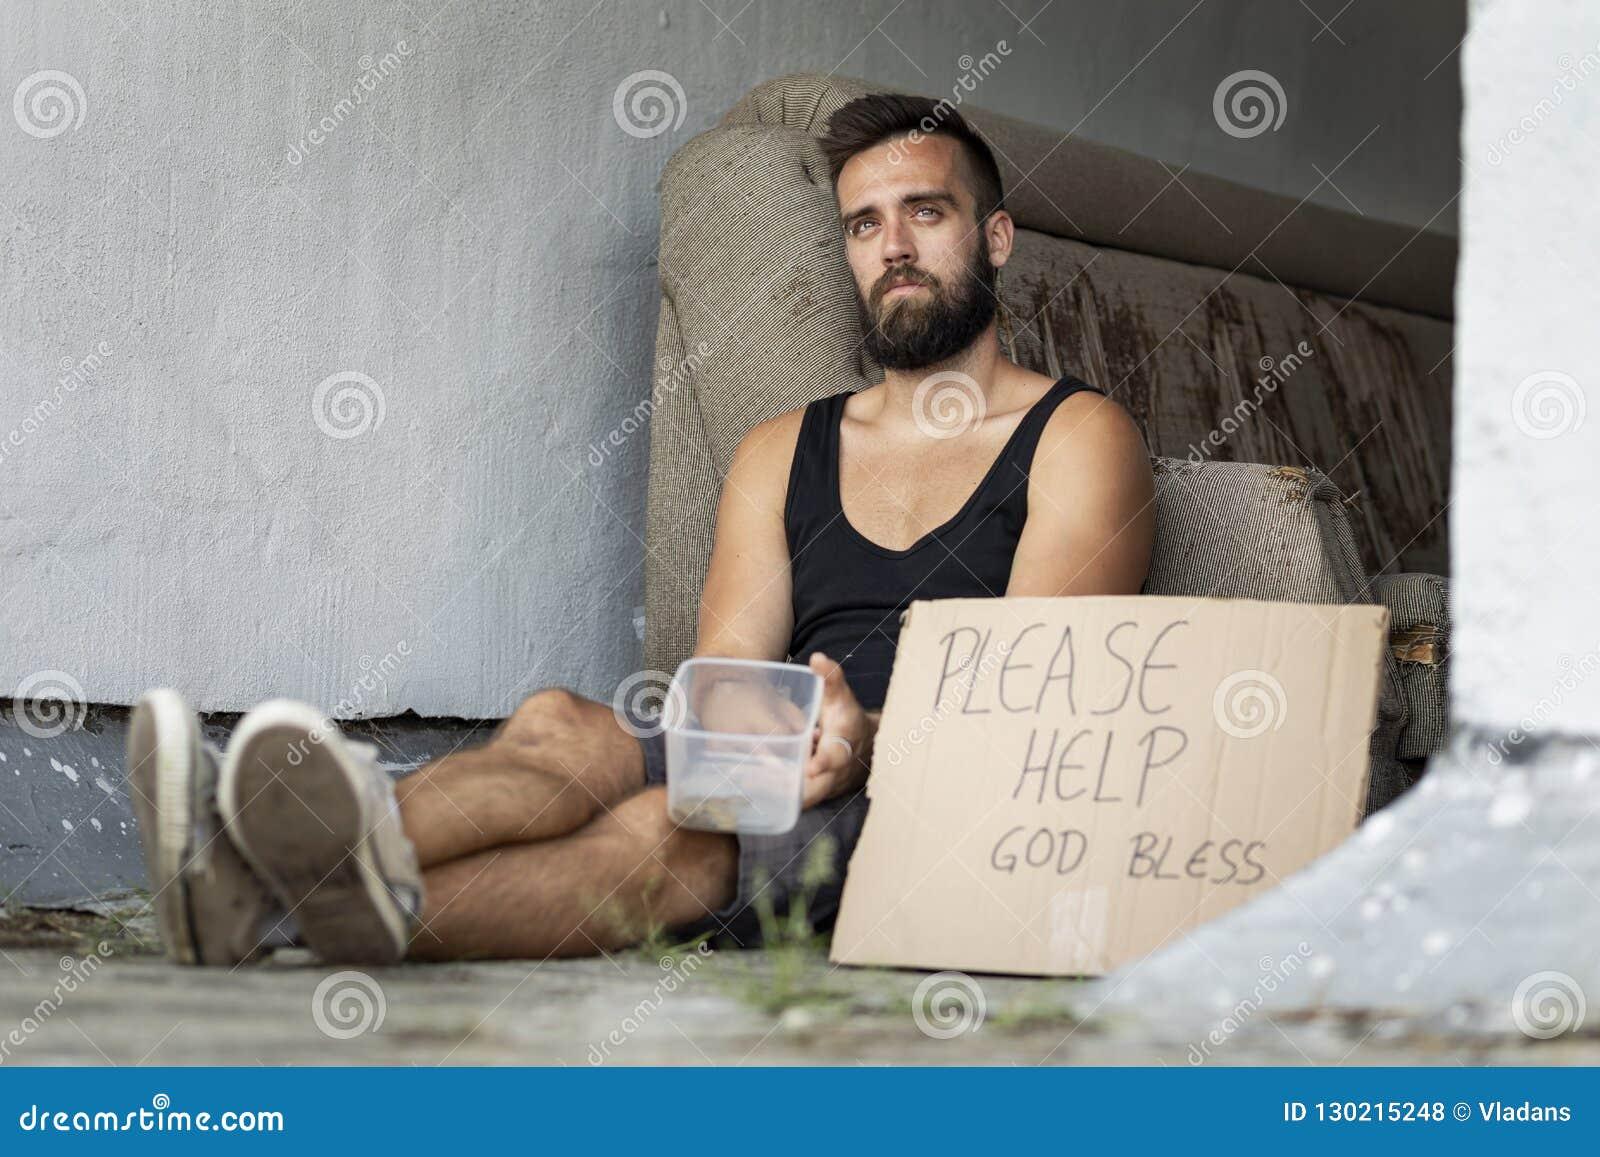 Bezdomny żebrak